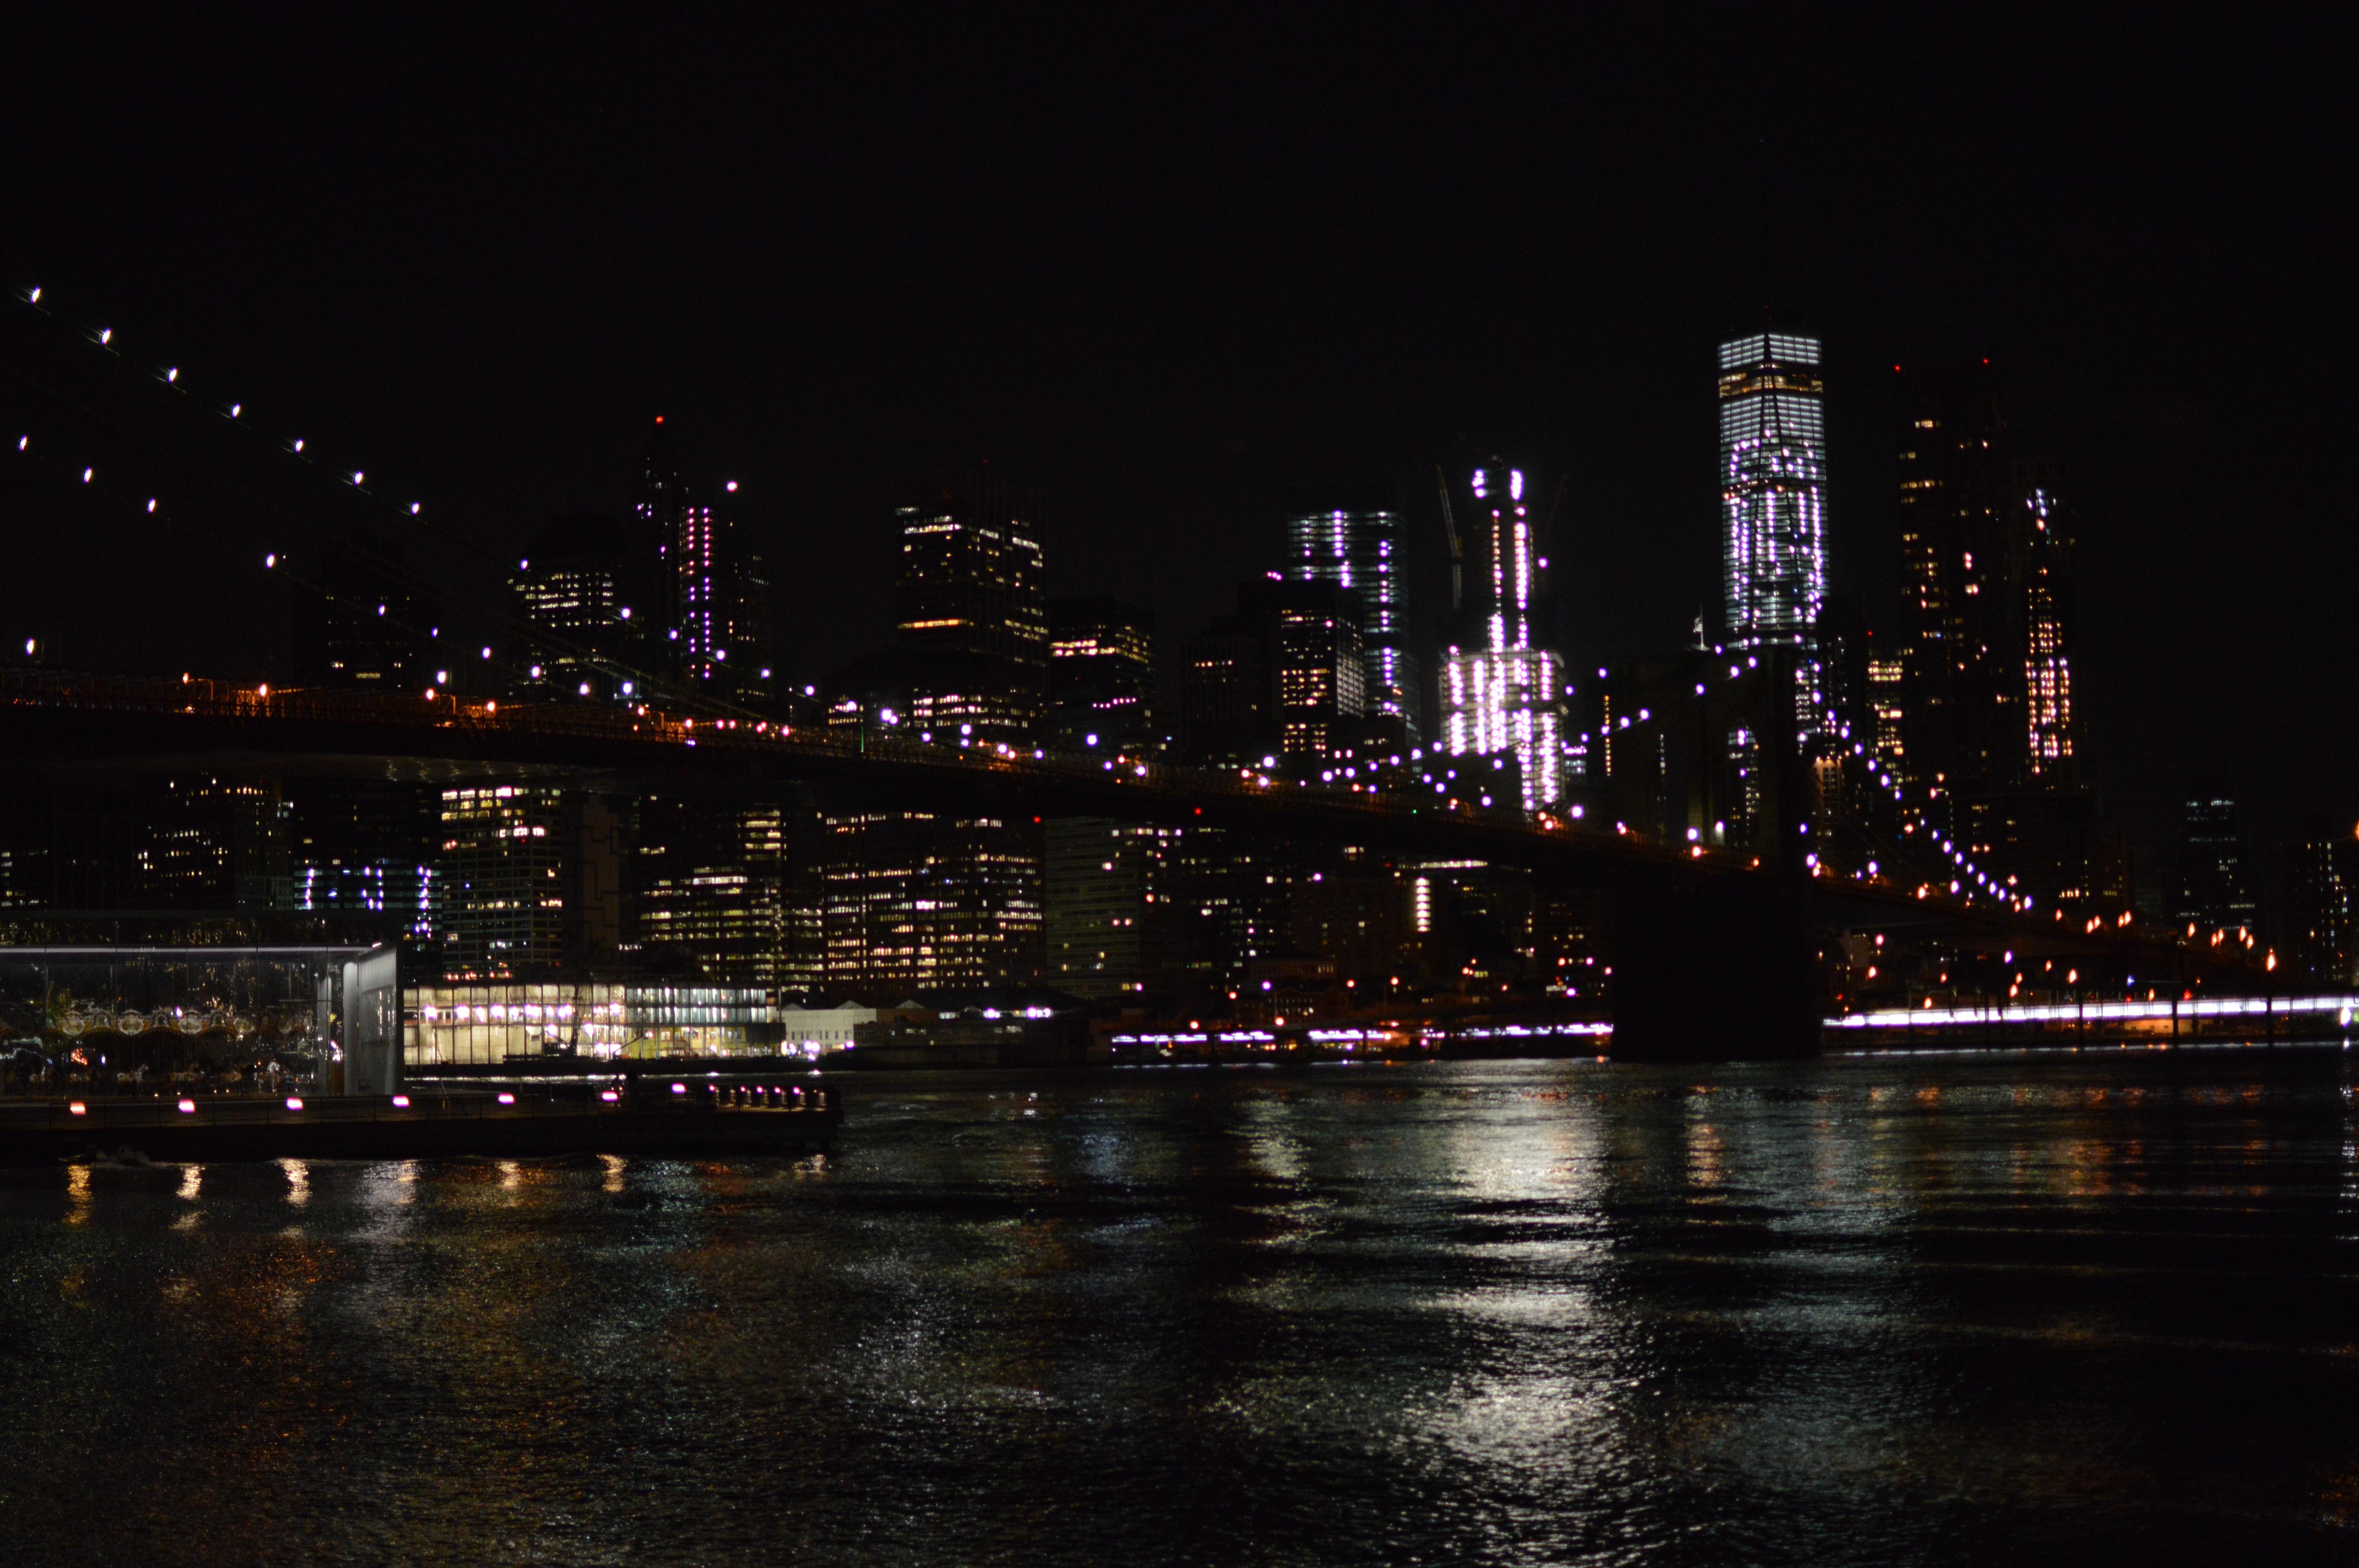 Free Stock Photo Of At Night Nighttime New York City Nyc Lights